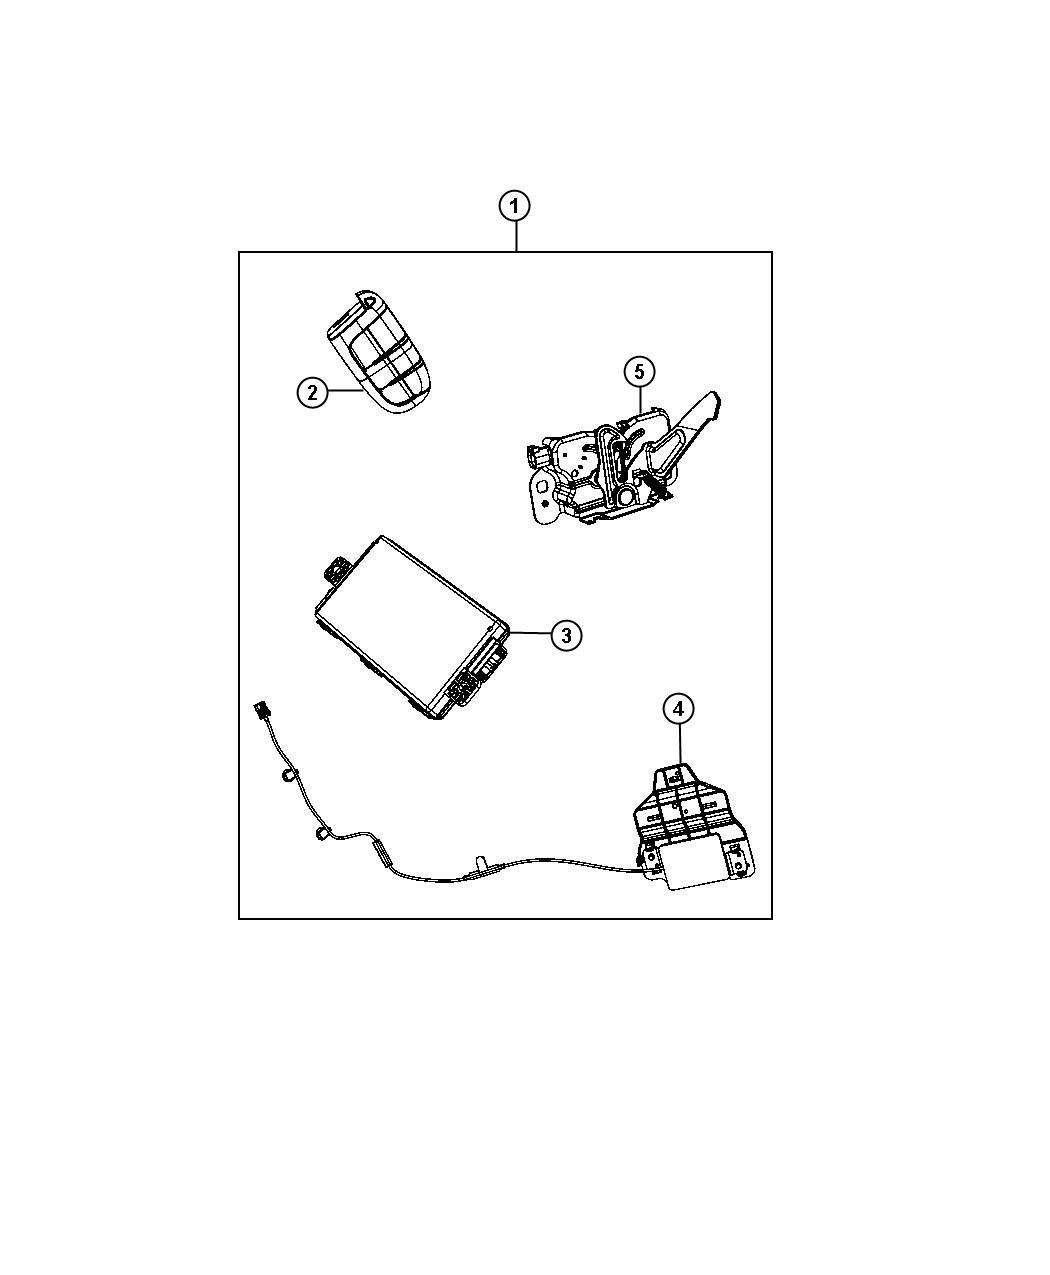 Jeep Compass Remote Start Complete